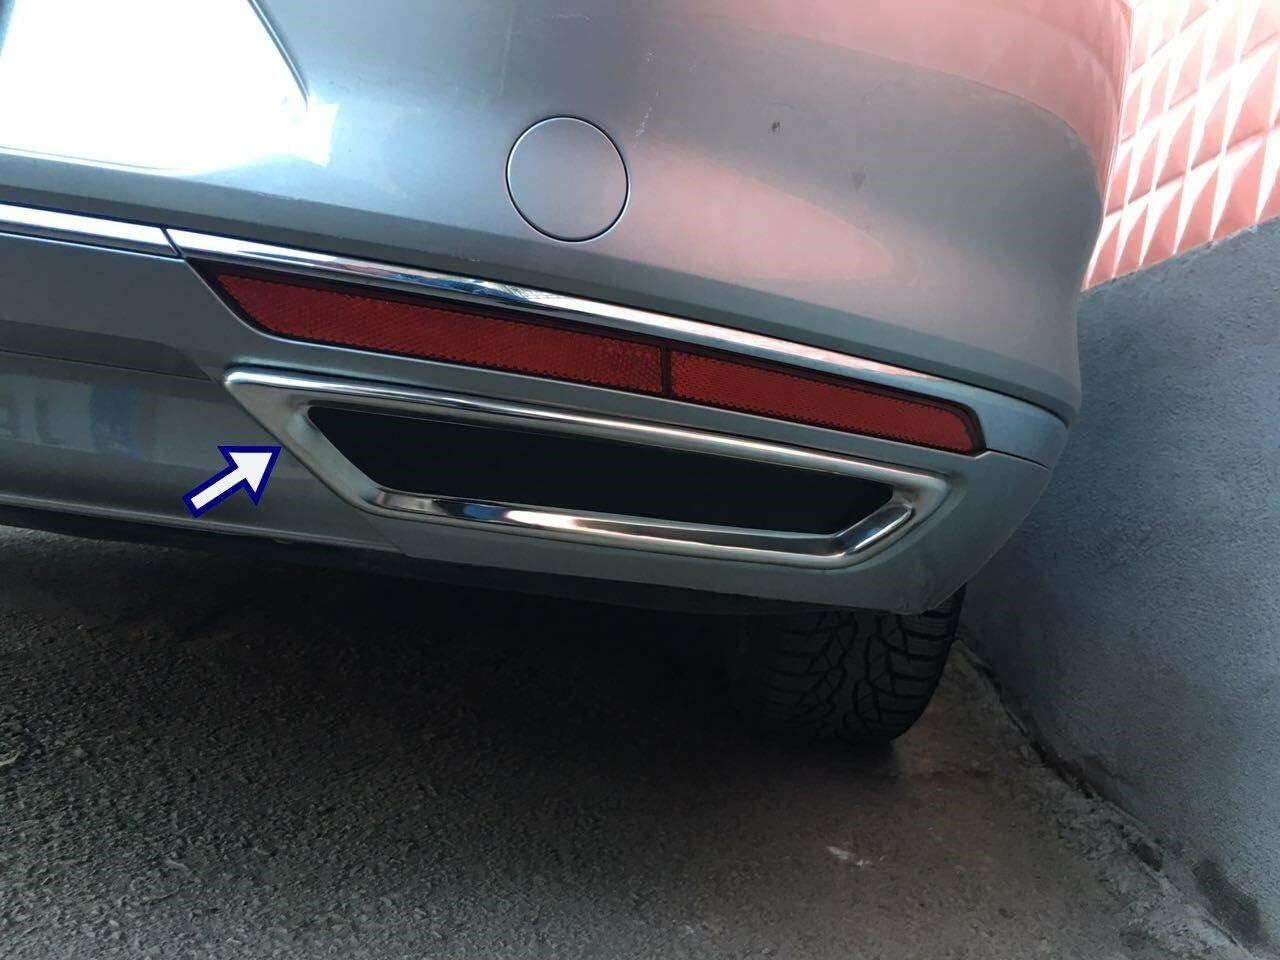 Passat B8 Limousine Edelstahl Chrom Auspuffblende Rahmen 2 St/ück 2014/–2017